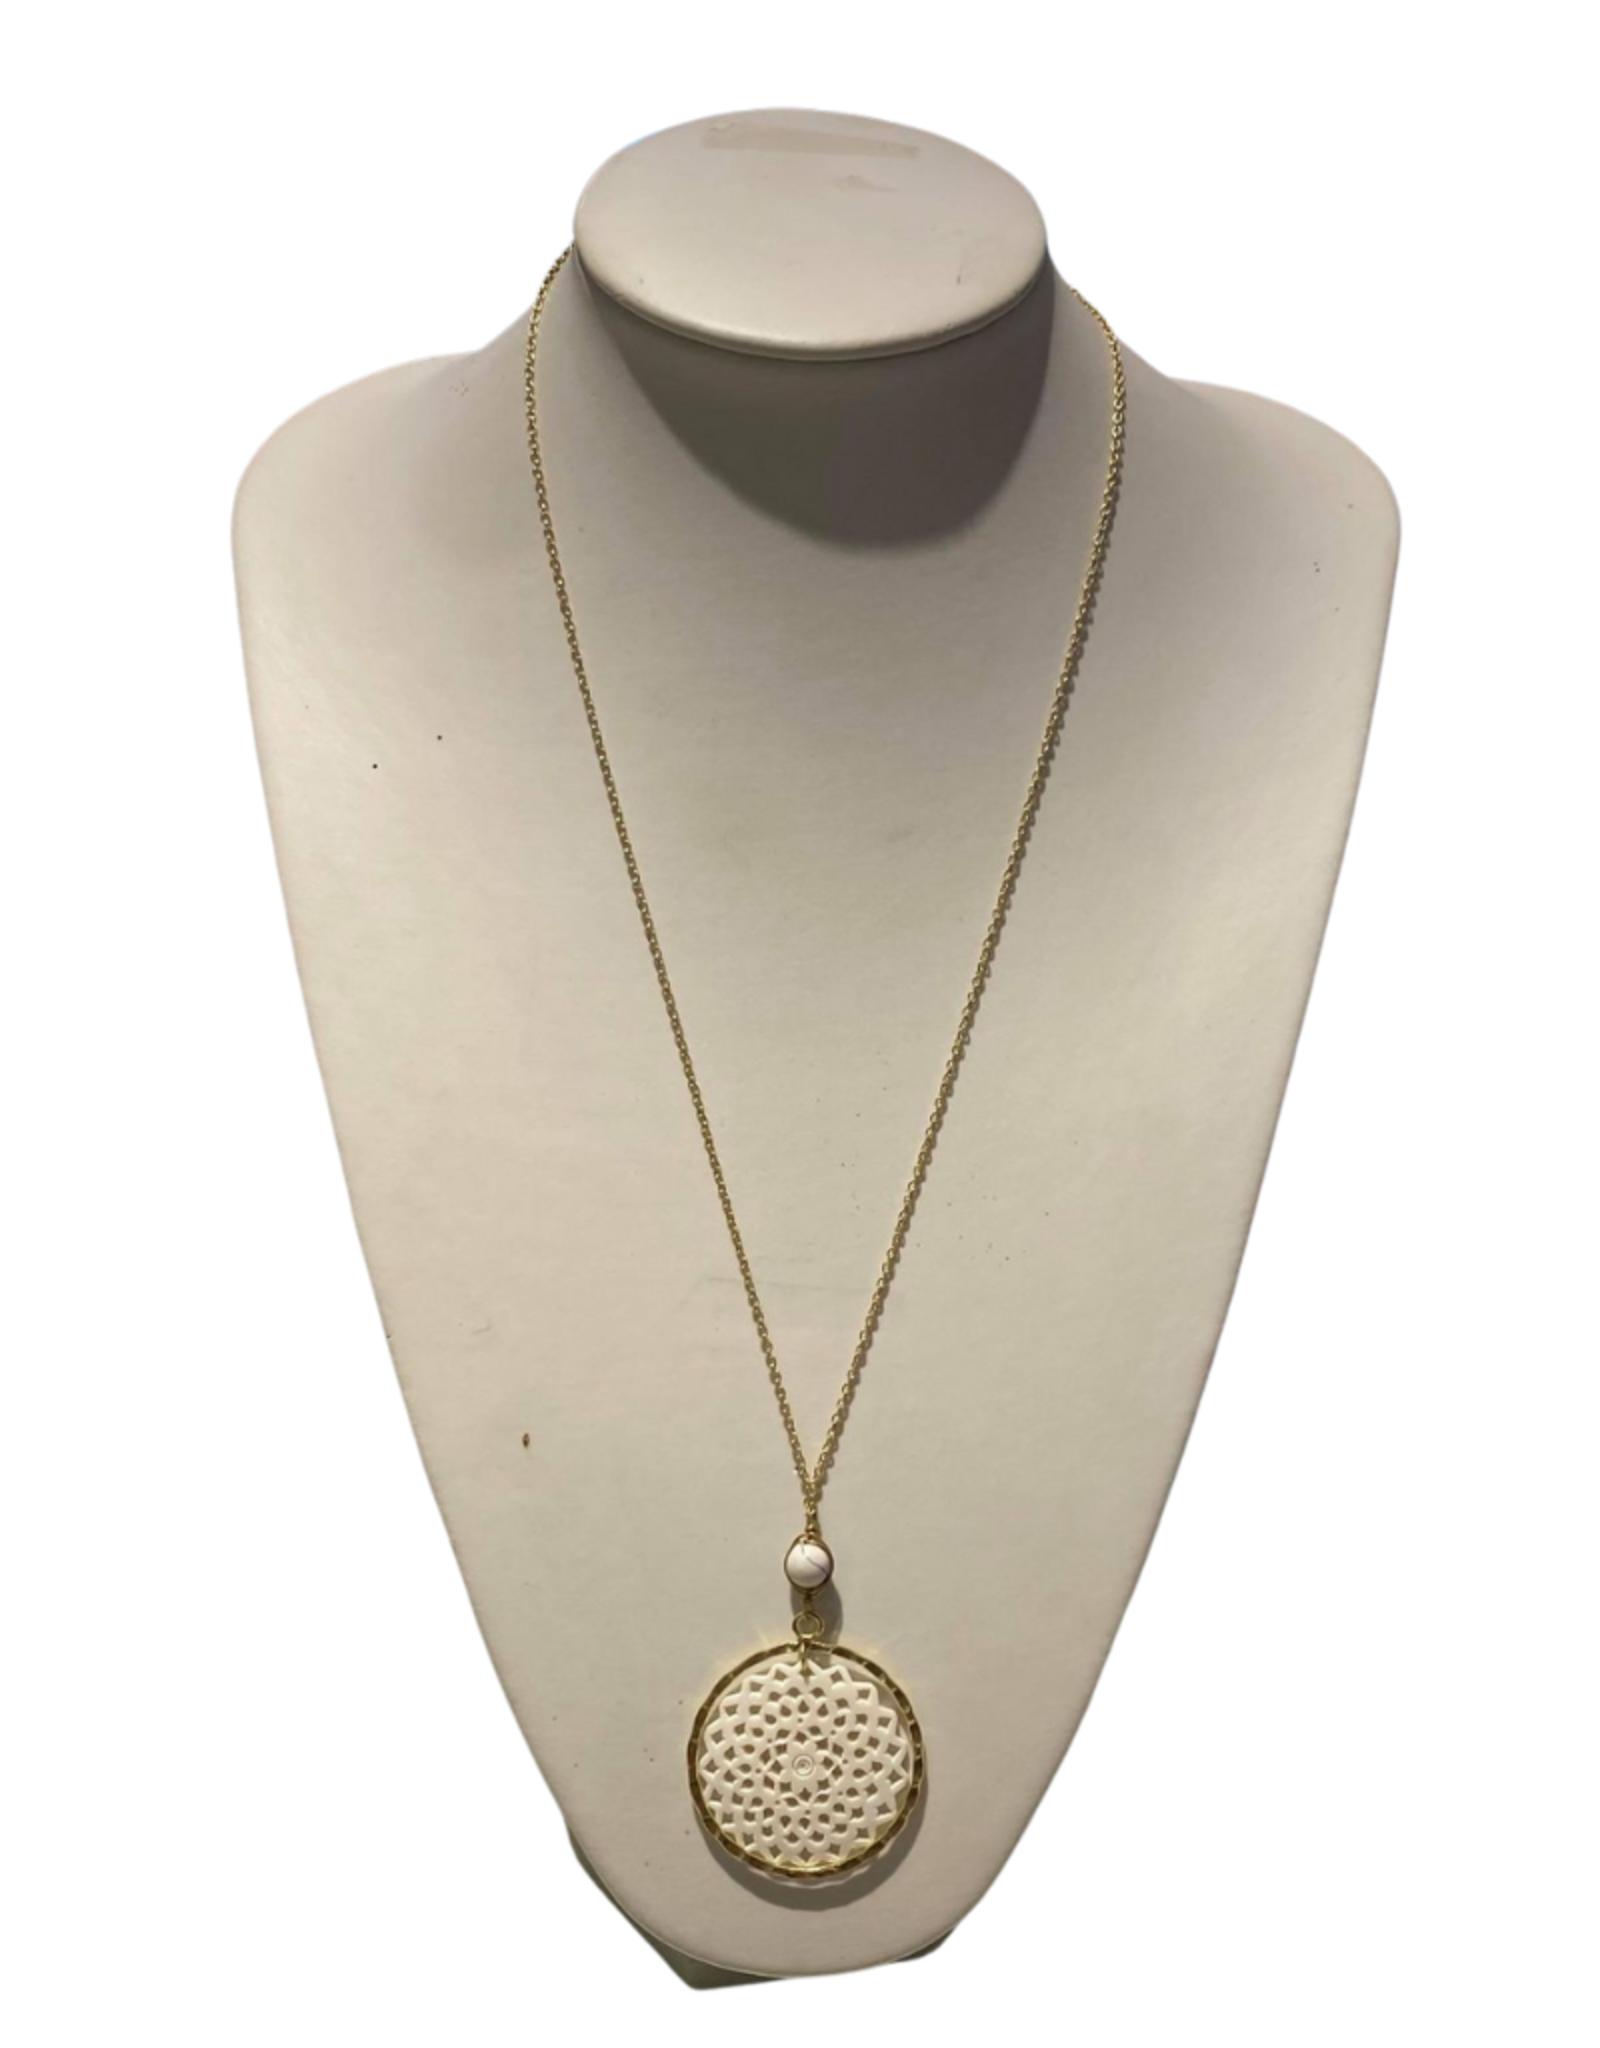 Ten Thousand Villages Necklace Round Filigree Bone/Clay Glass Bead Tassel - India